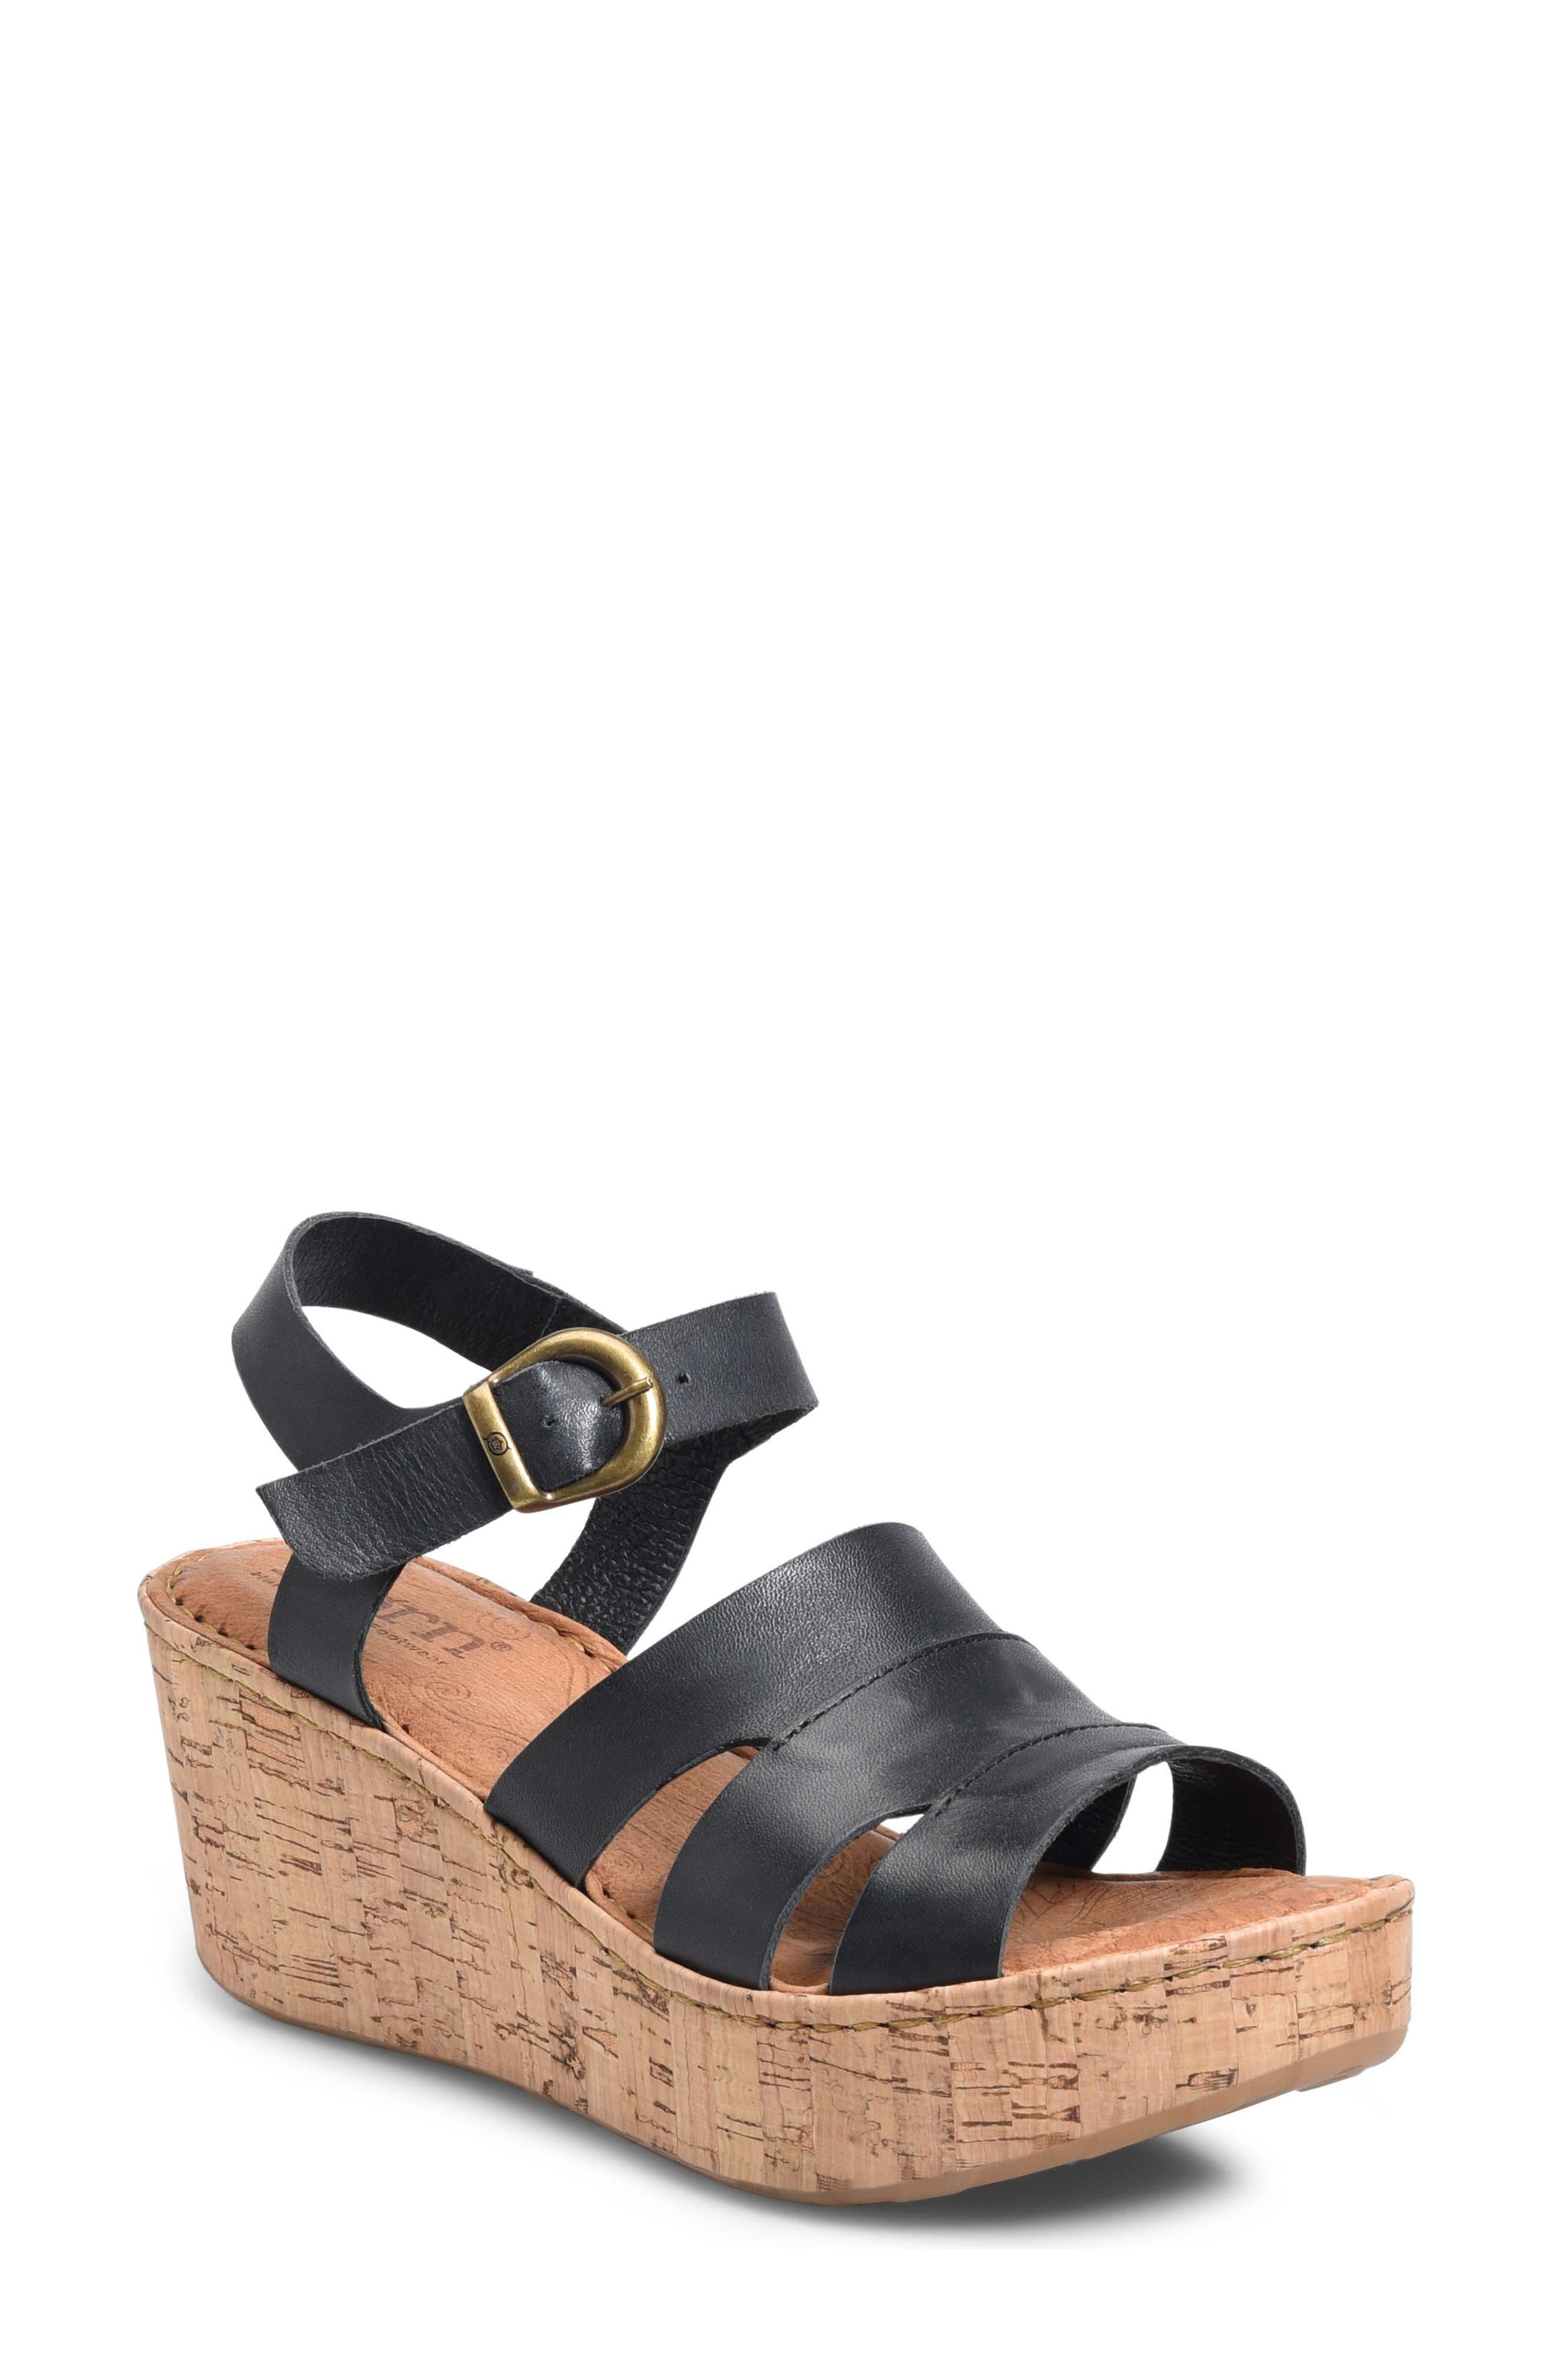 Anori Platform Wedge Sandal,                         Main,                         color, 001